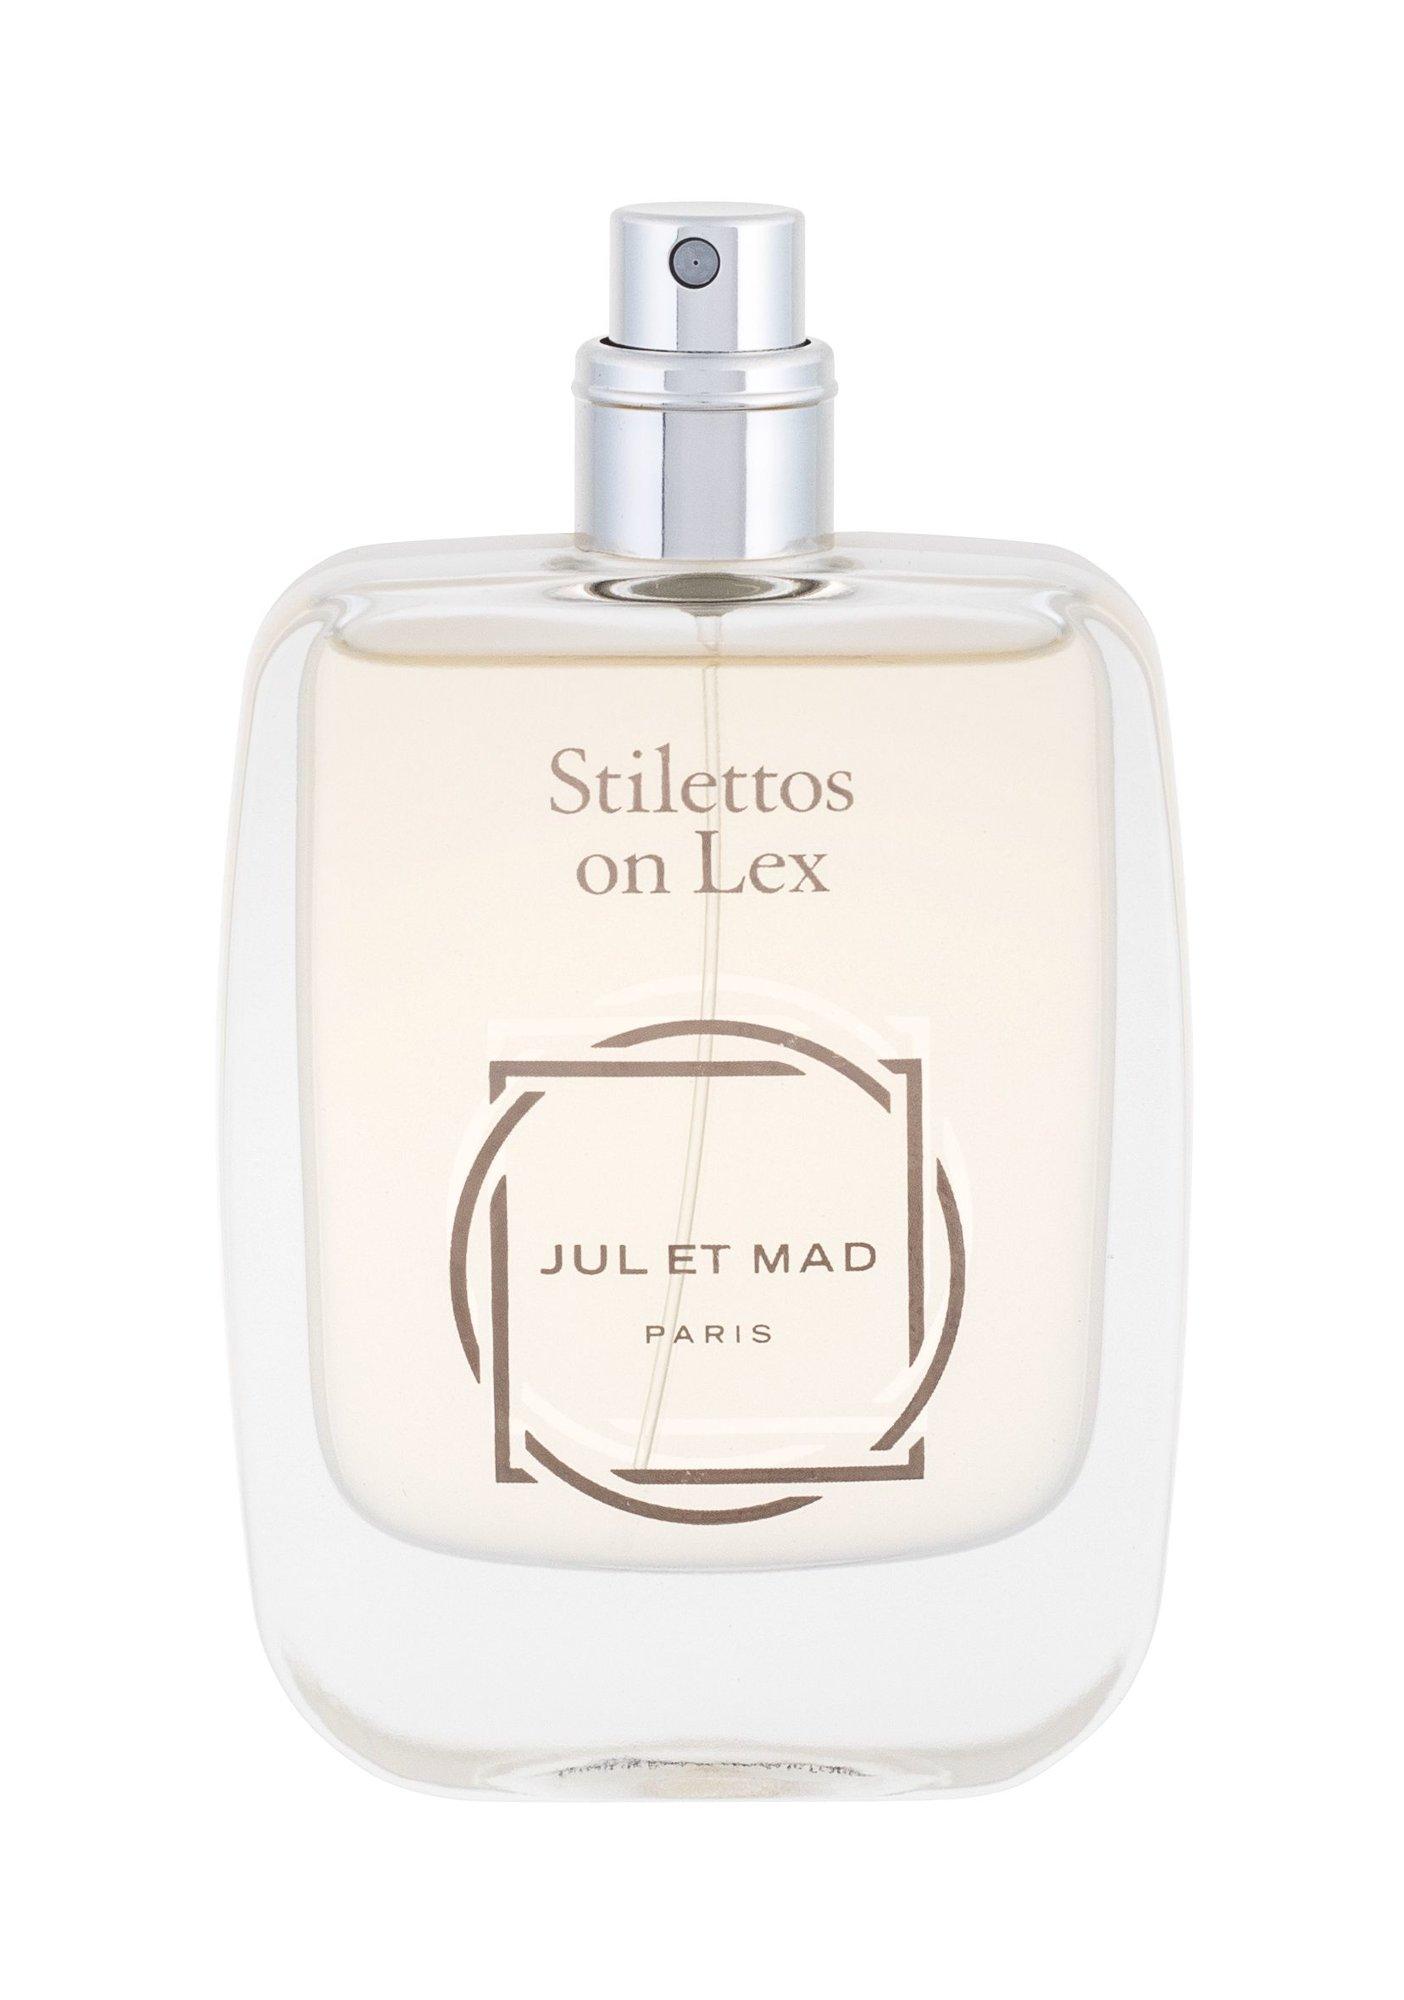 Jul et Mad Paris Stilettos on Lex Perfume 50ml